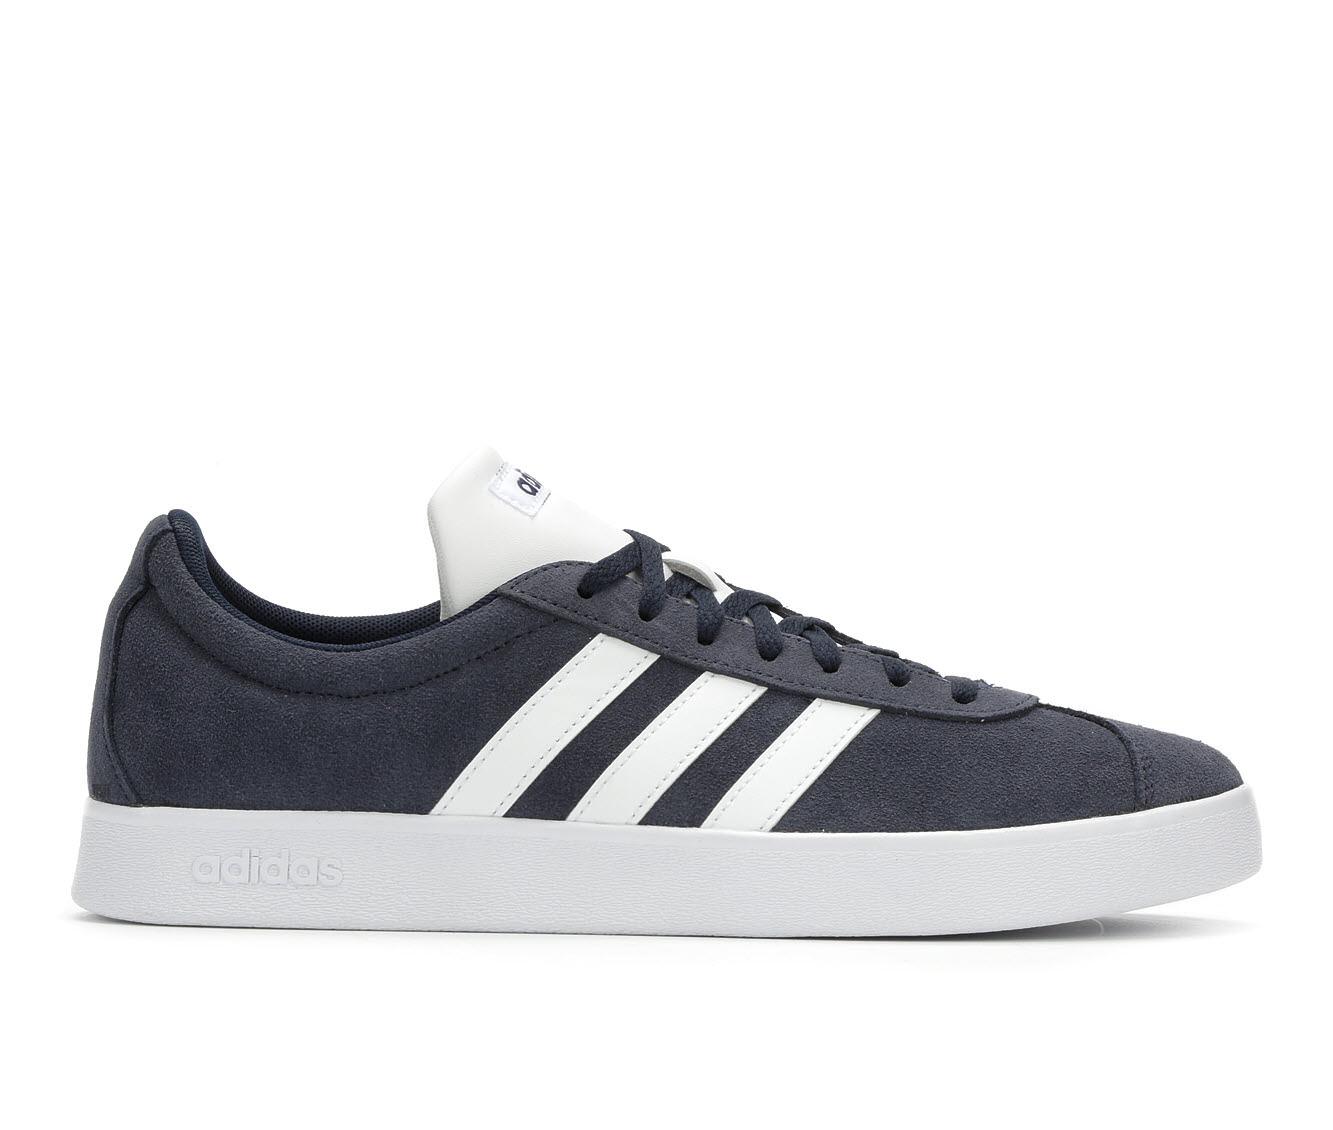 Men's Adidas VL Court 2.0 Sneakers (Blue - Size 7) 1714437